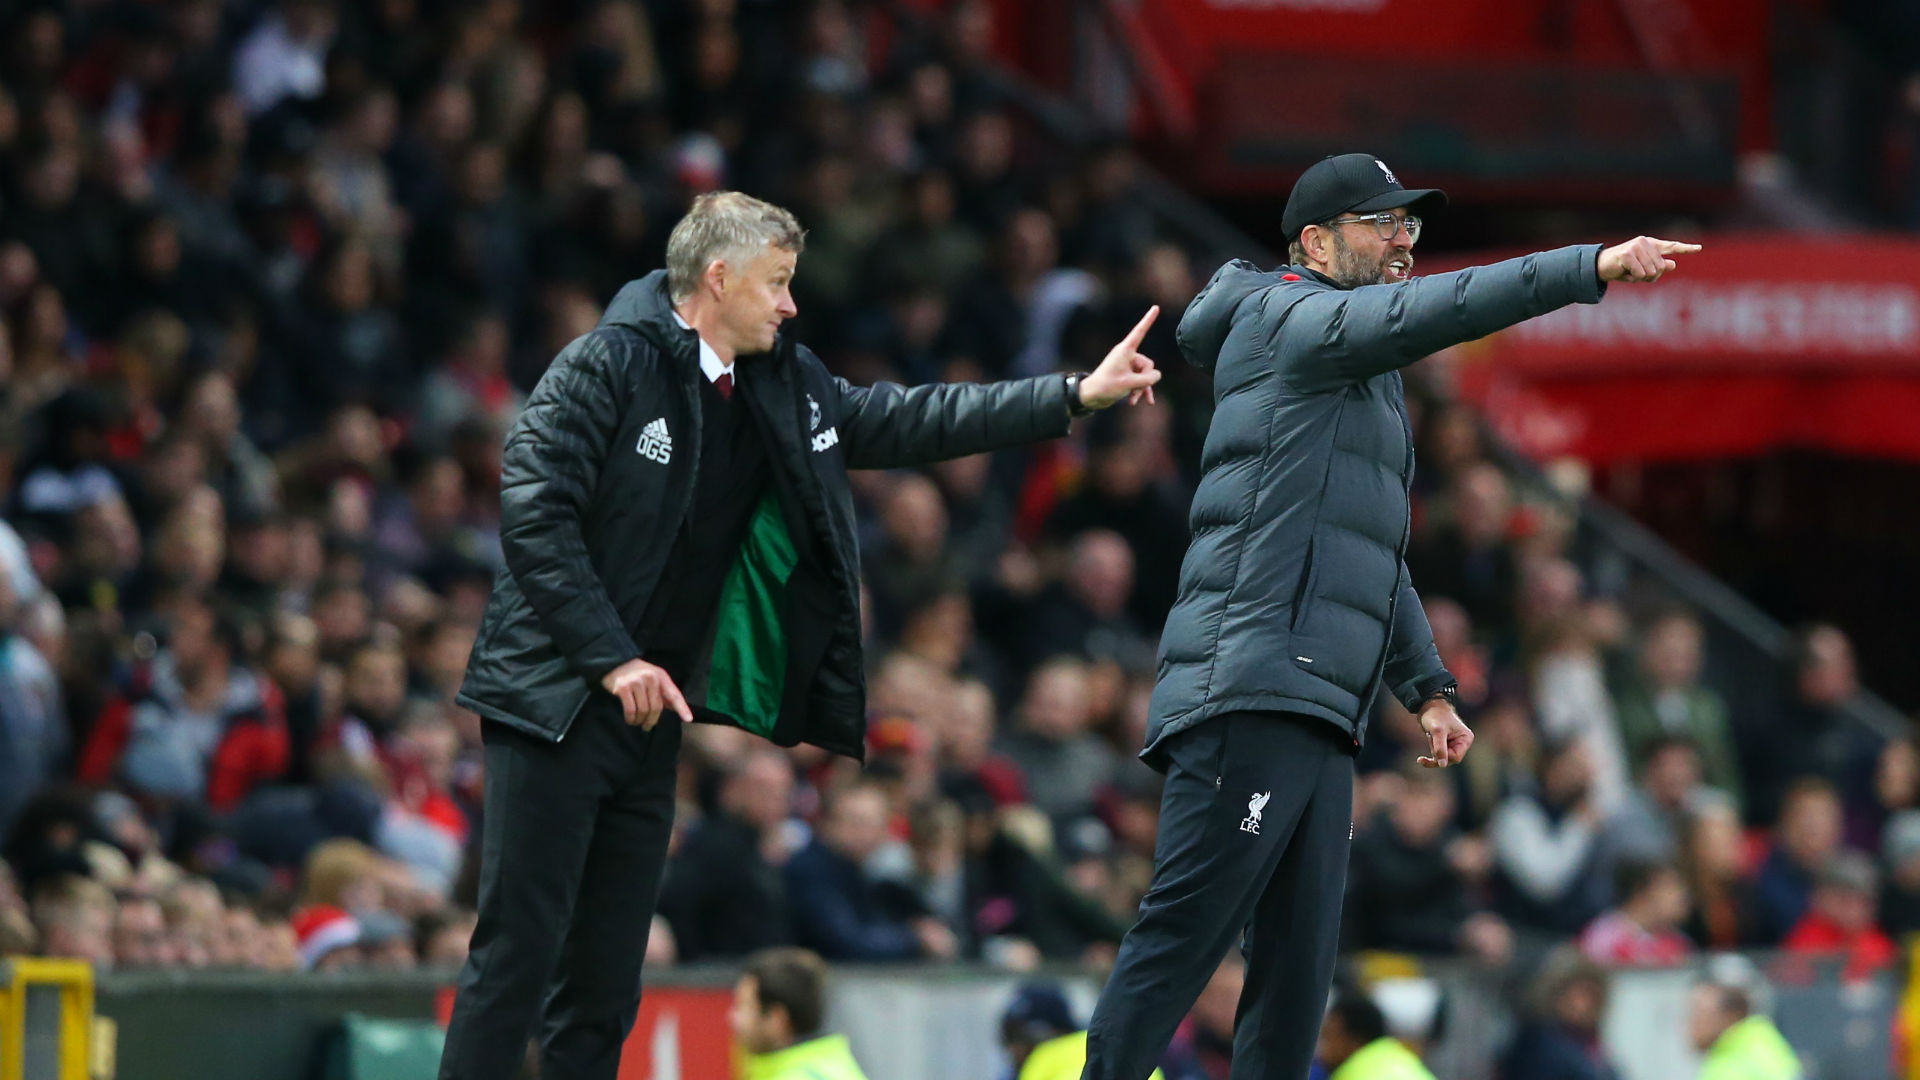 Big Match Focus: Liverpool vs Manchester United